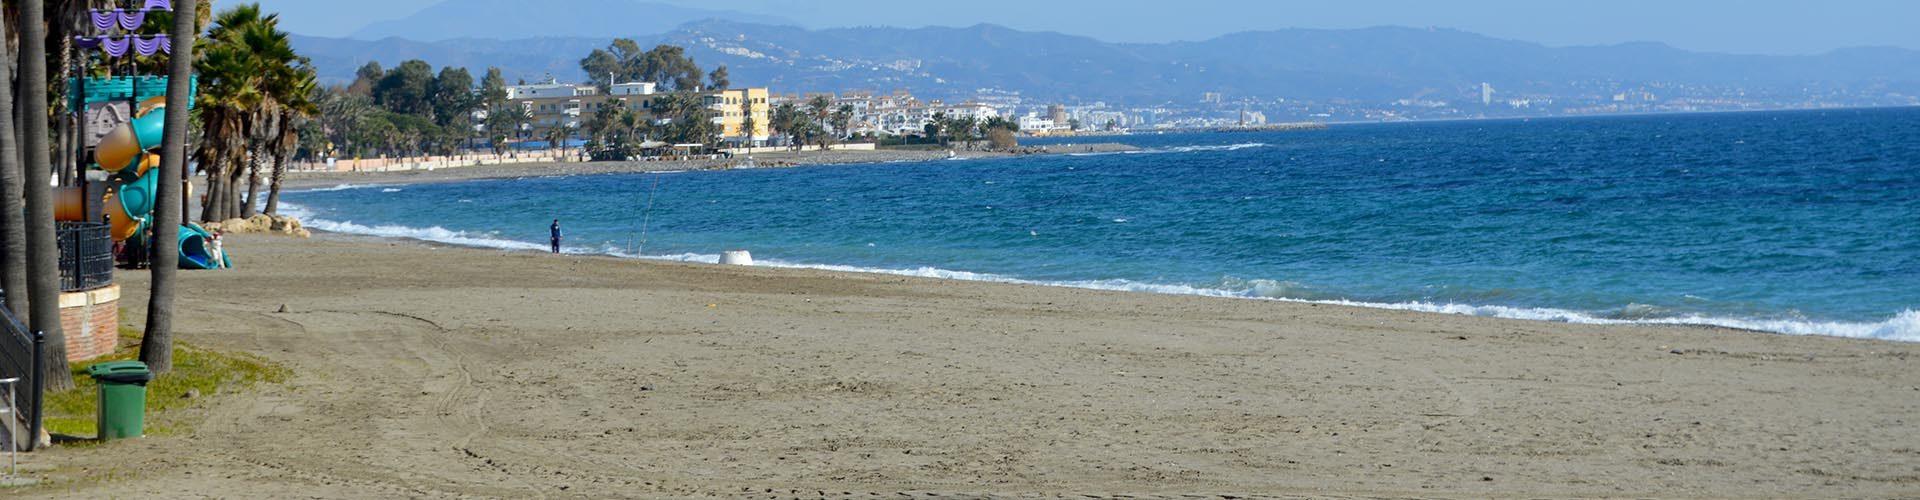 La zone San Pedro plage - Marbella Unique Properties